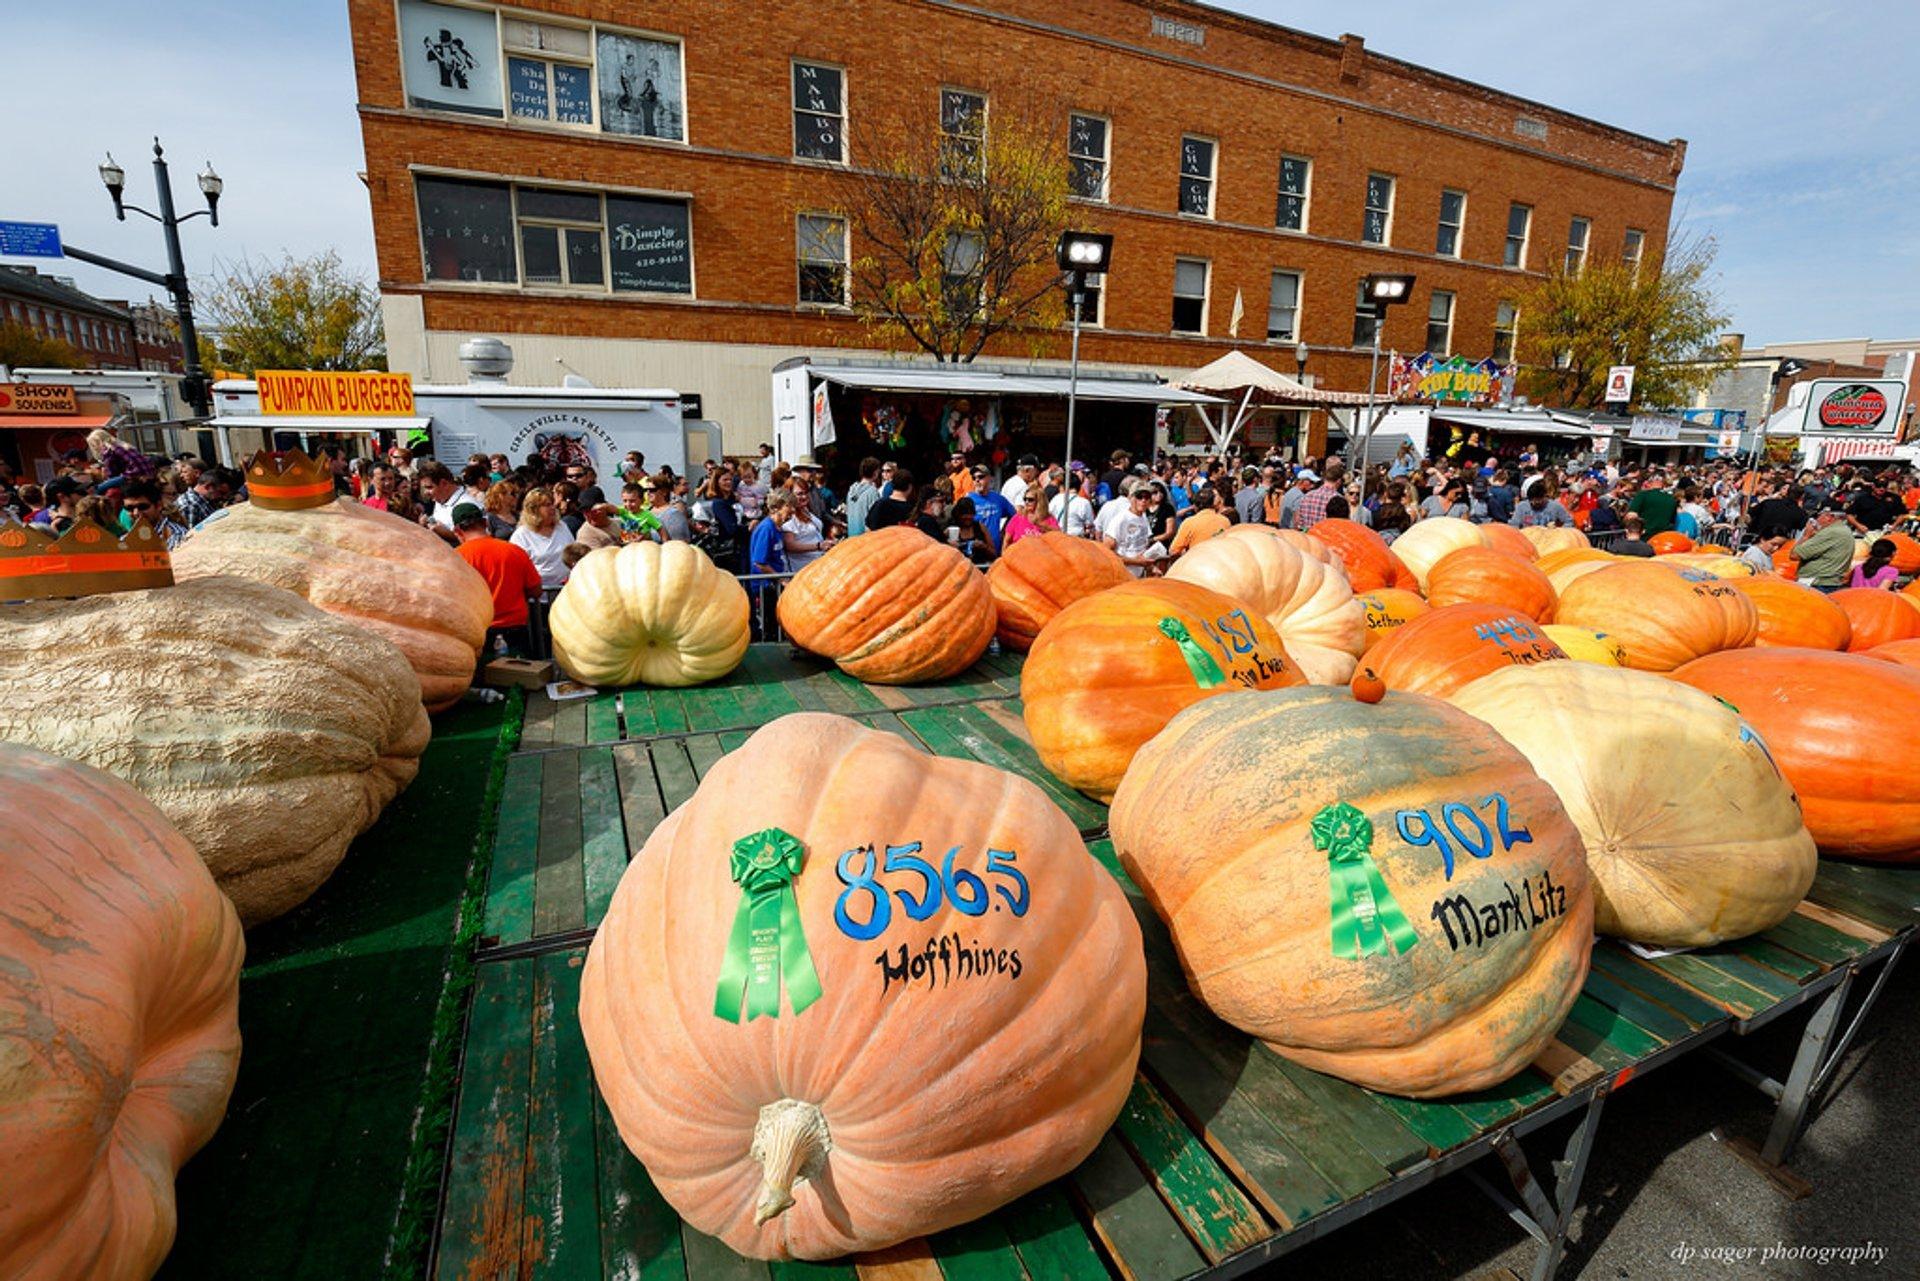 Pumpkin Show 2020.Circleville Pumpkin Show 2019 In Ohio Dates Map